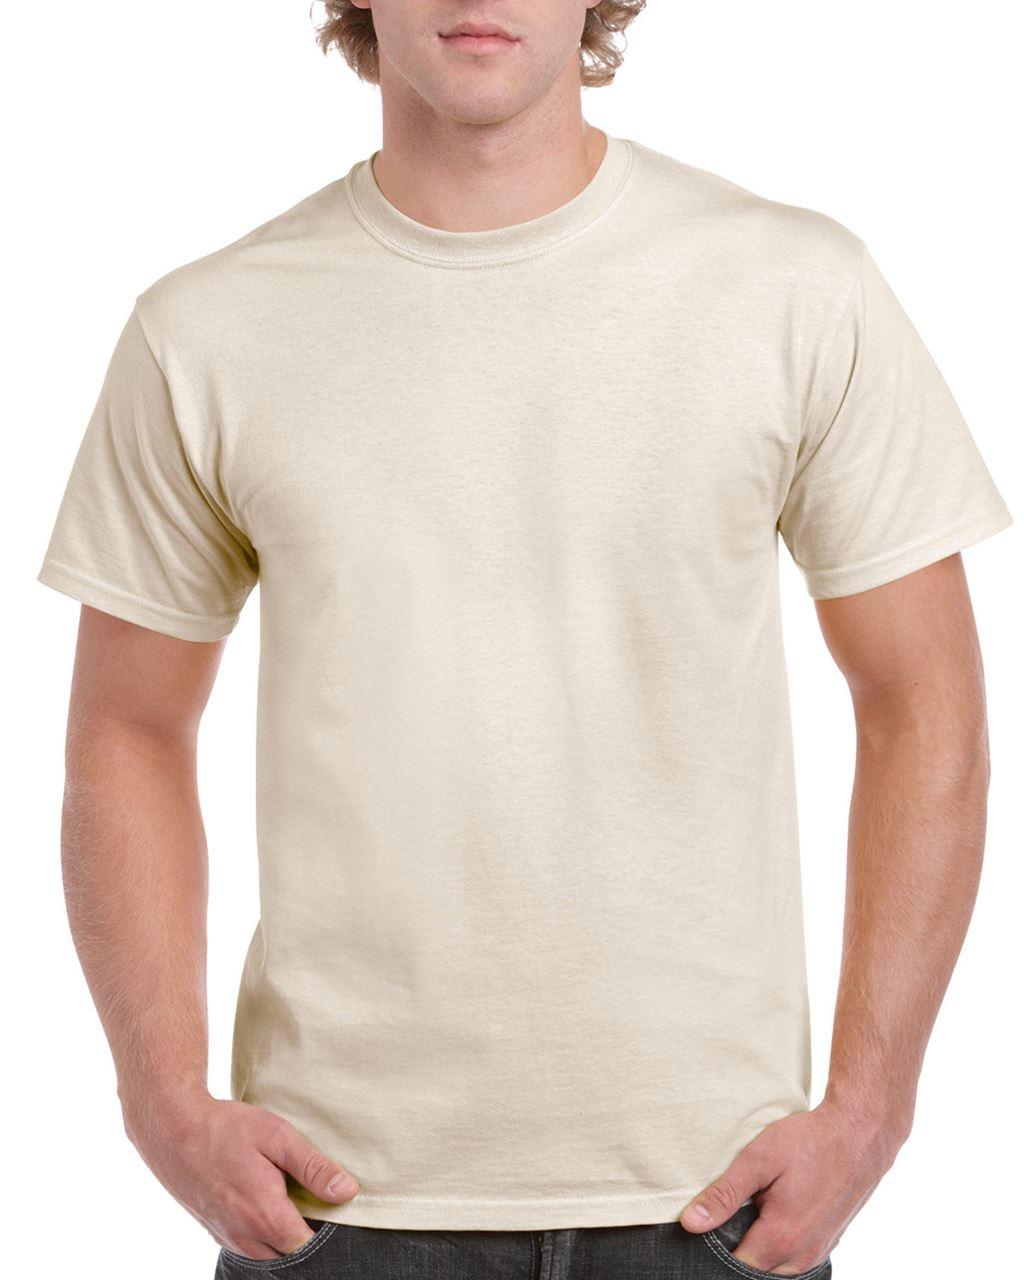 Tricou bumbac unisex barbatesc Gldan serigrafie broderie termotransfer DTG | Toroadv.ro